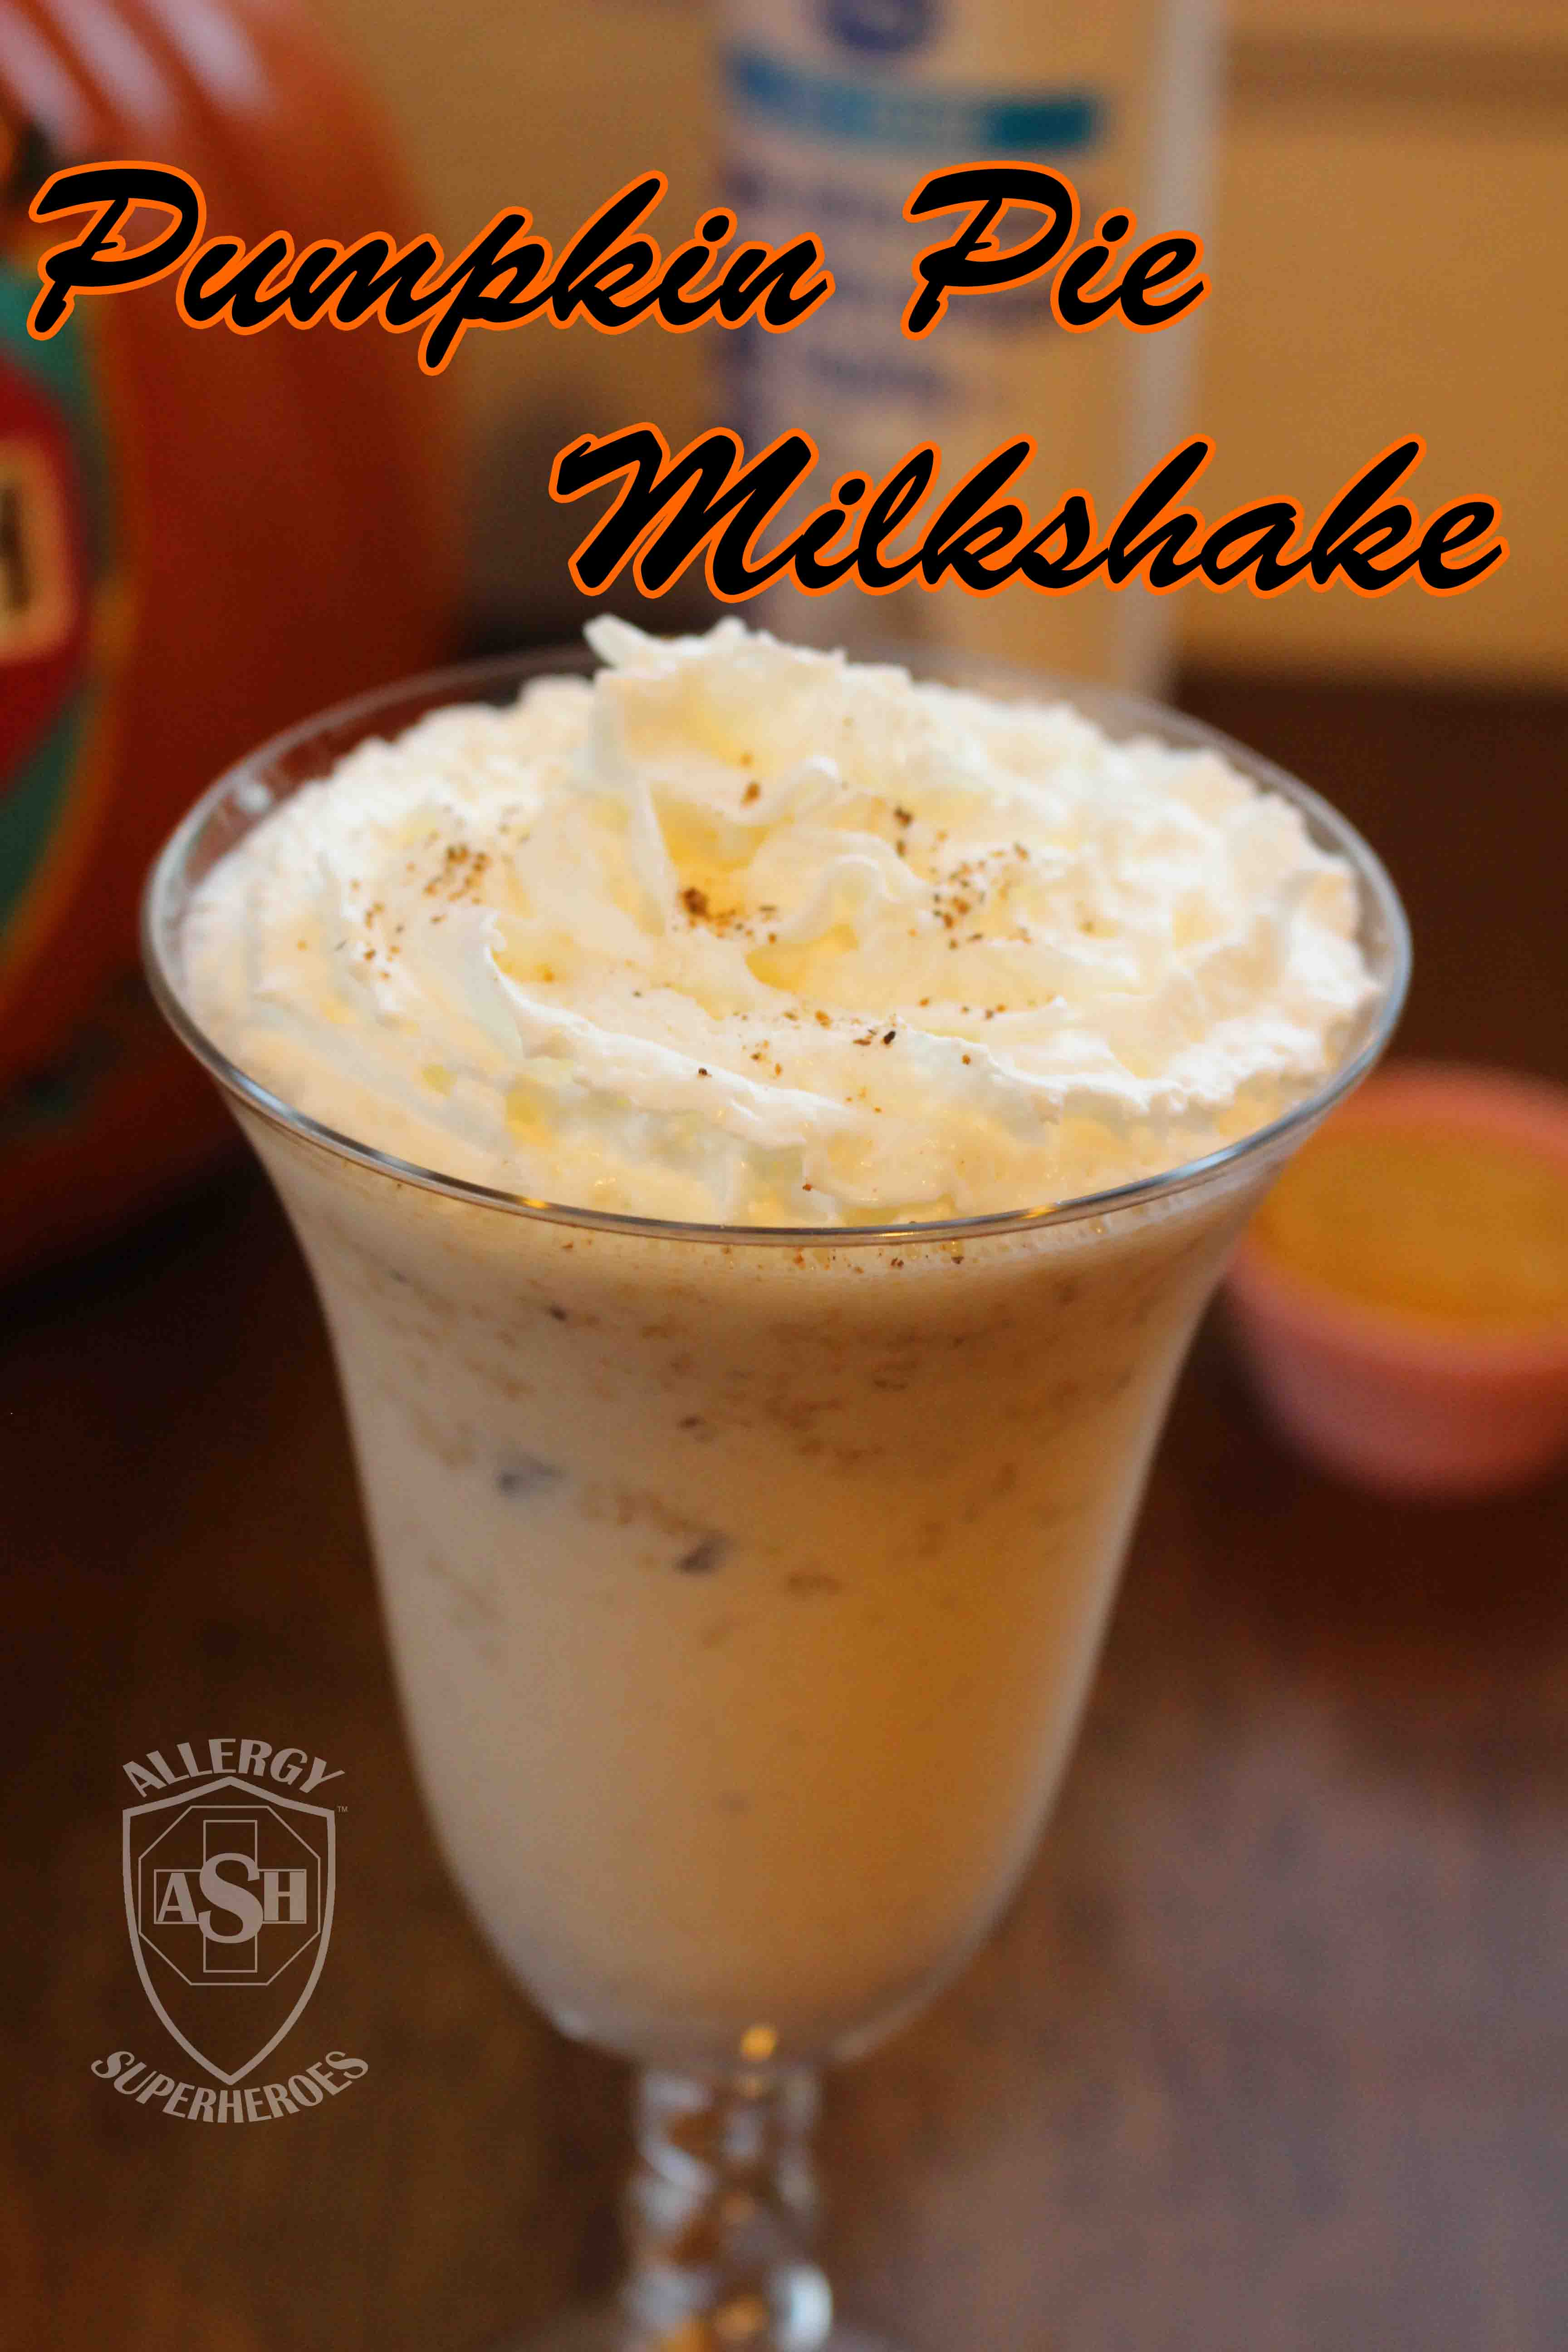 Scrumptious Pumpkin Pie Milkshake | Perfect for Autumn! | from Allergy Superheroes